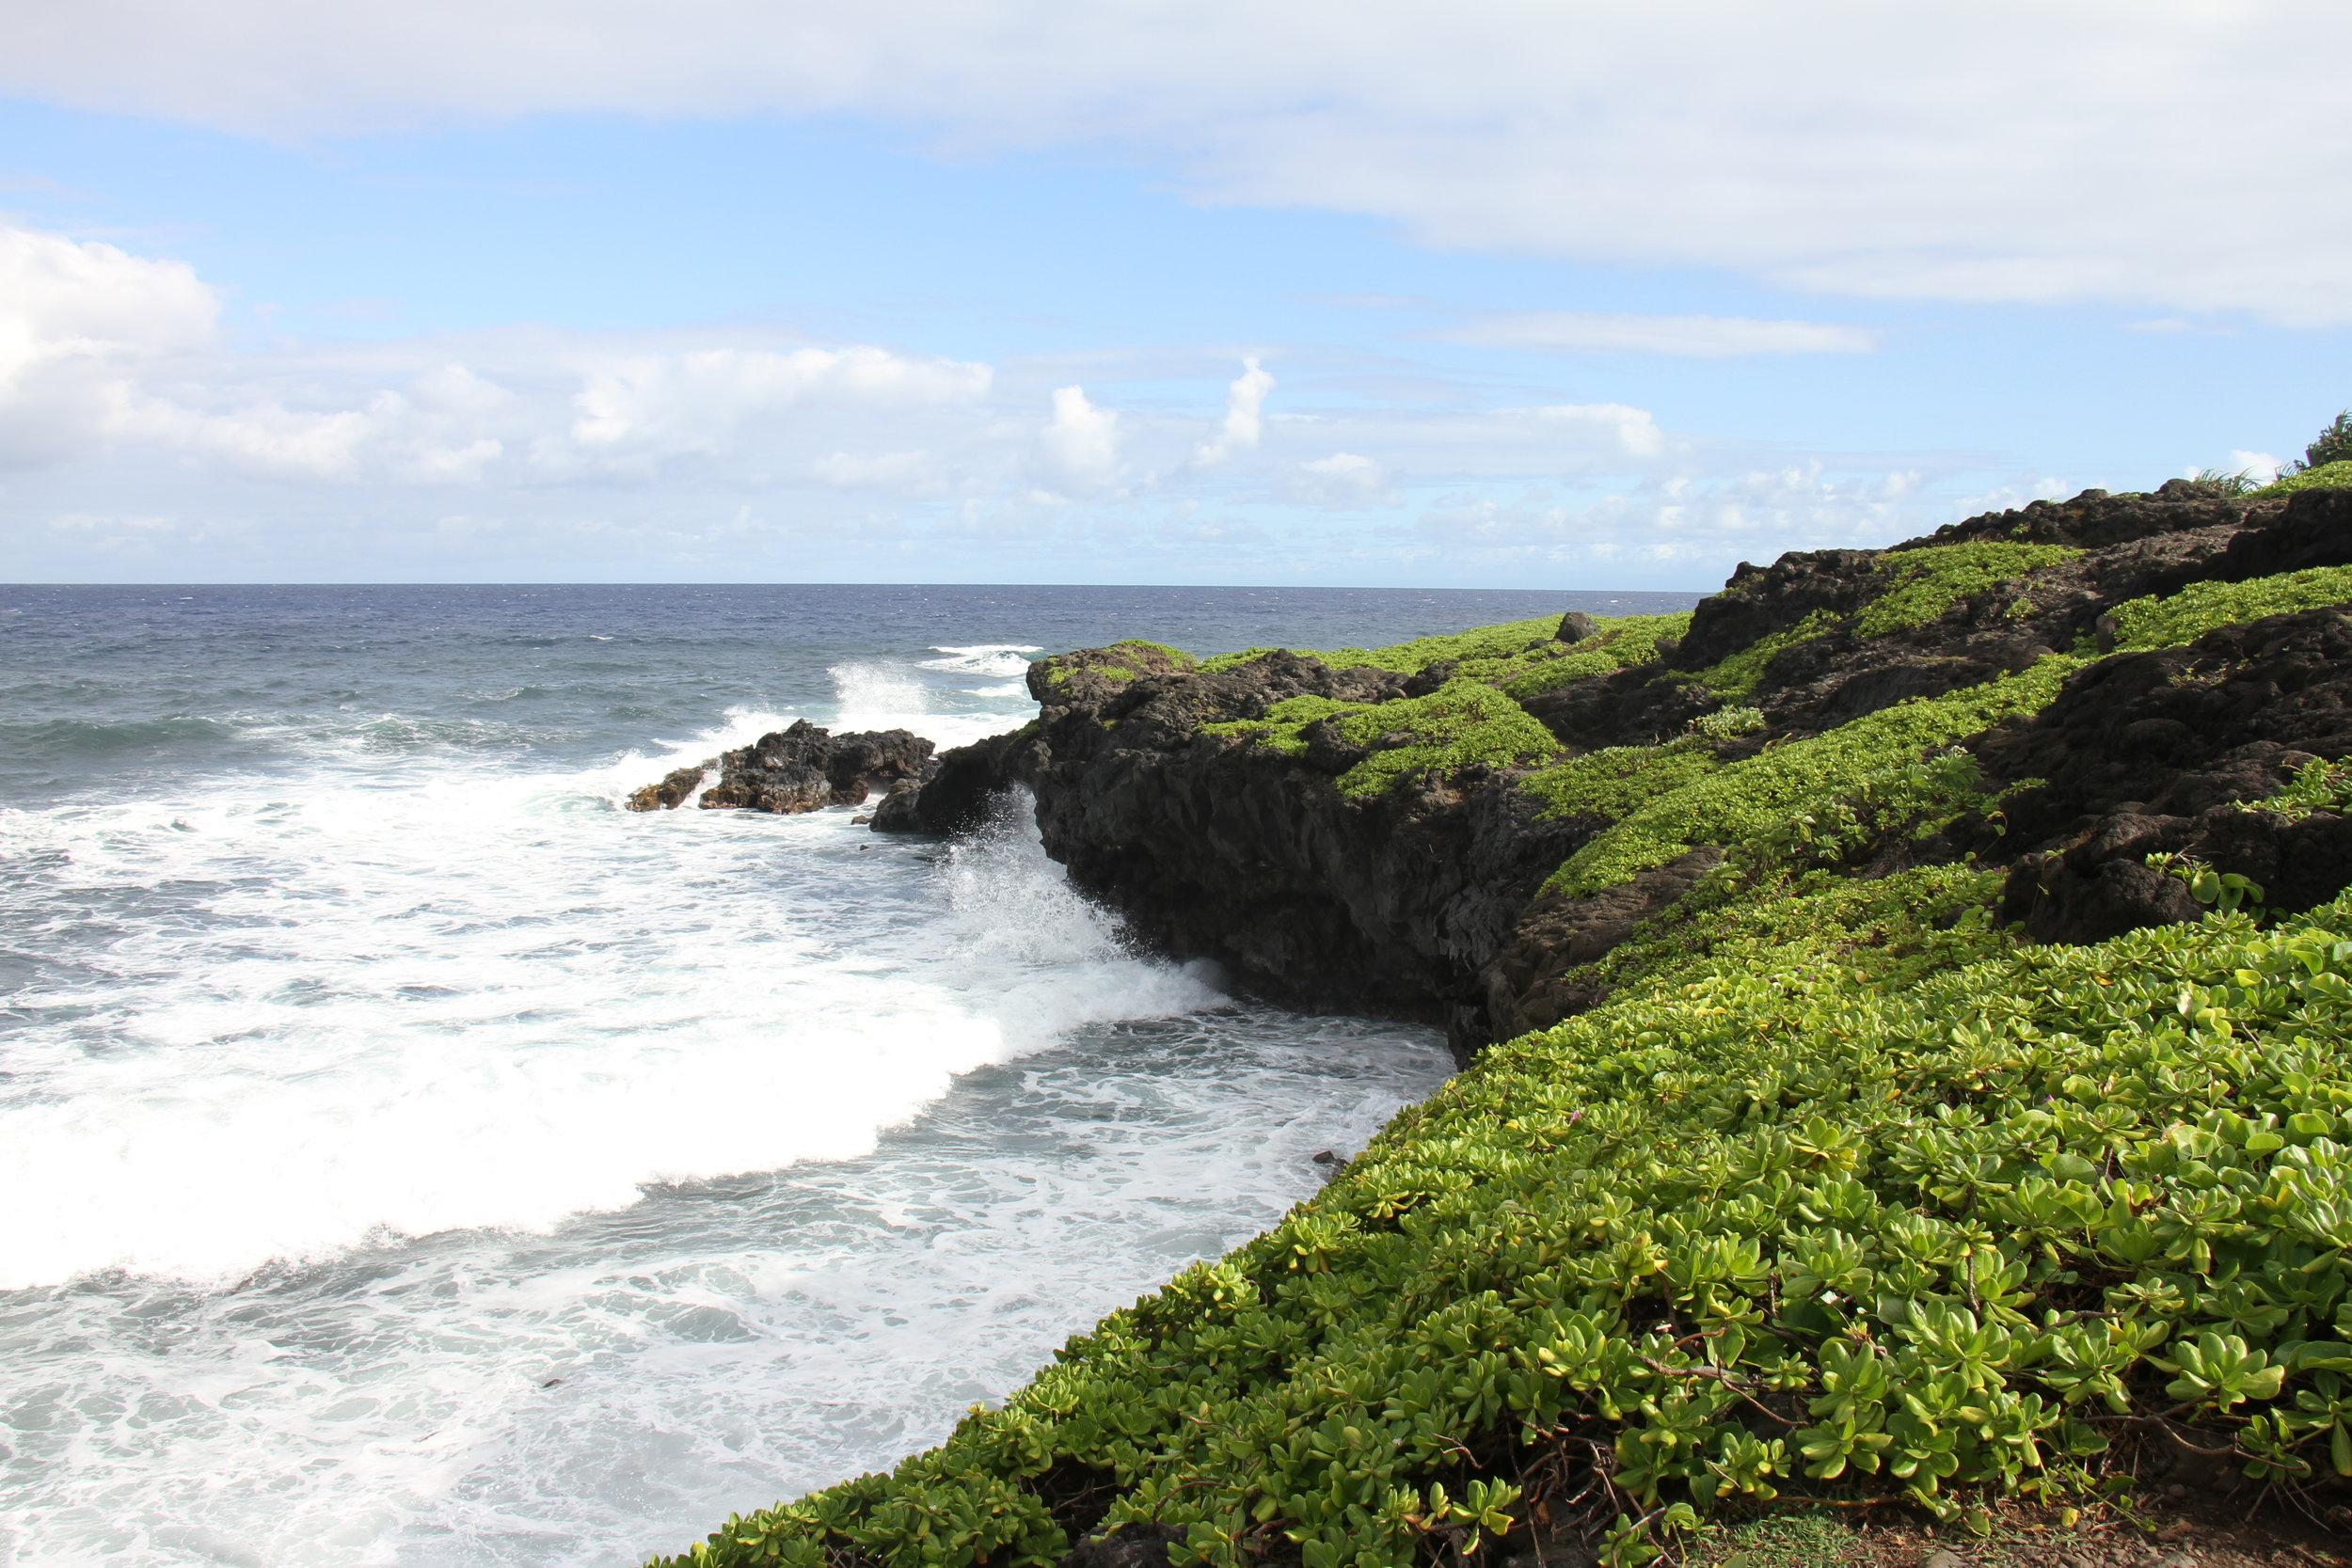 Road to Hana- Haleakala National Park - Seven Sacred Pools at Ohe'o